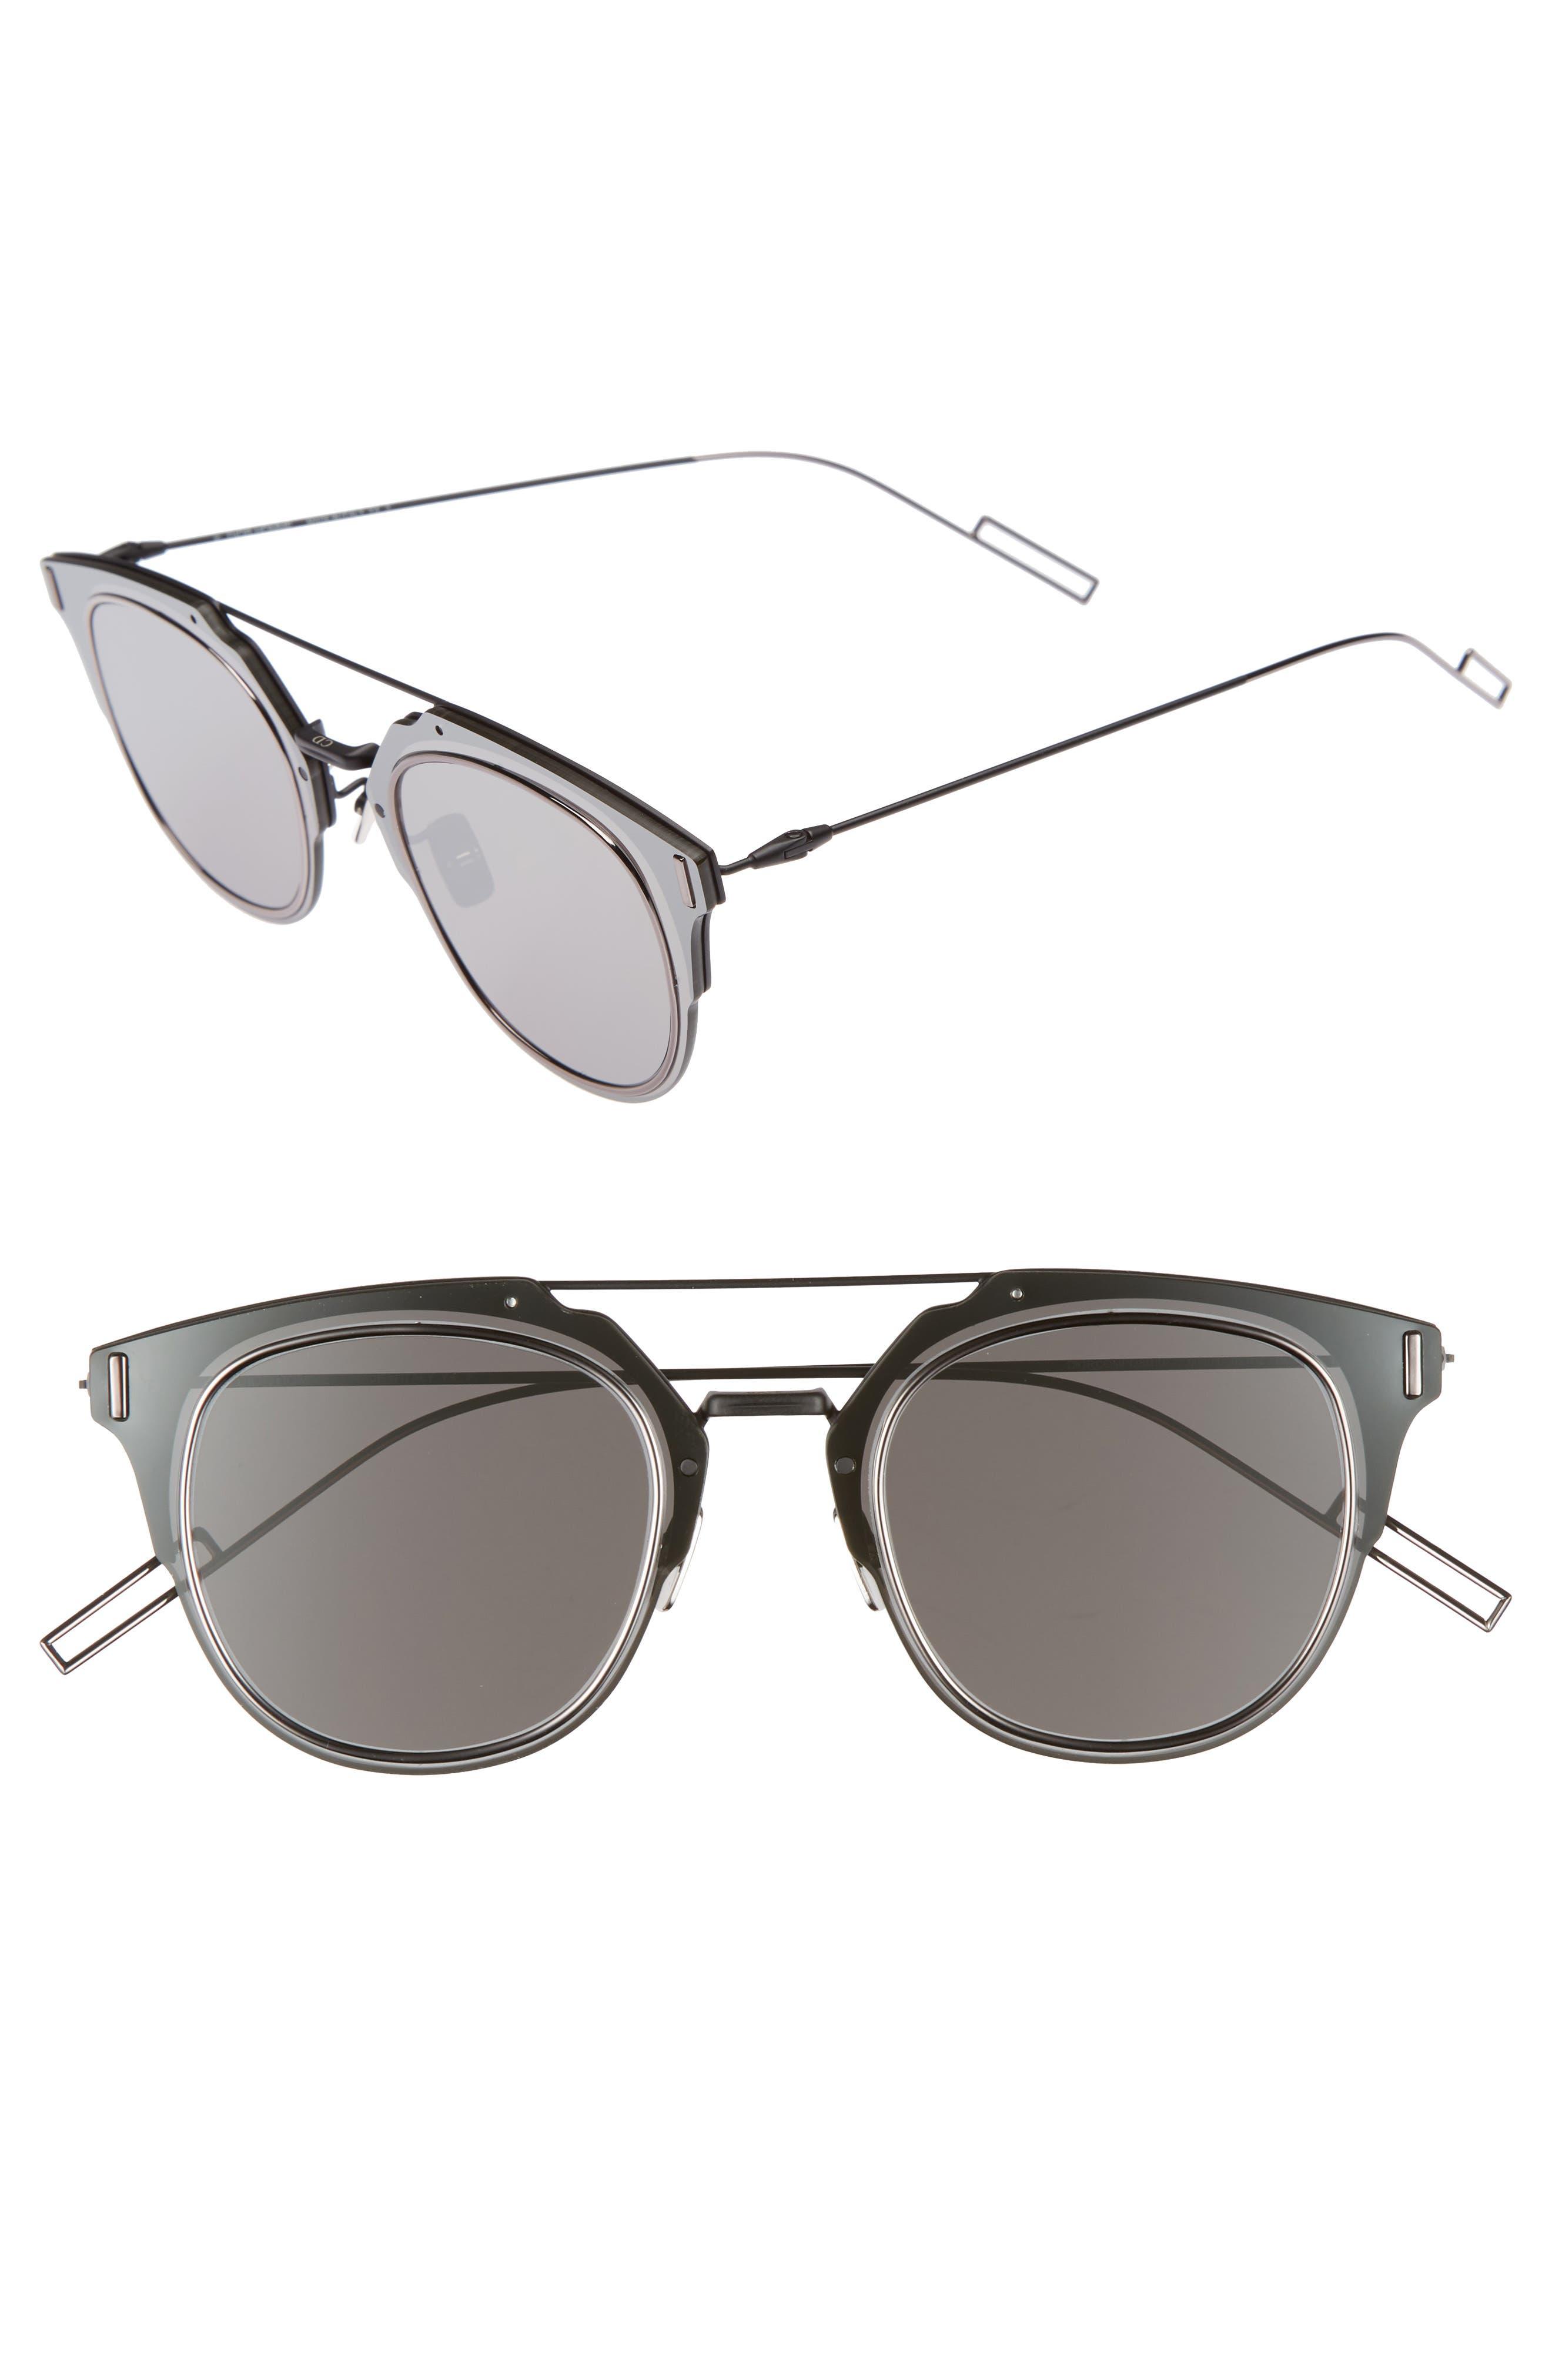 DIOR HOMME 'Composit 1.0S' 62Mm Metal Shield Sunglasses - Oxford Black